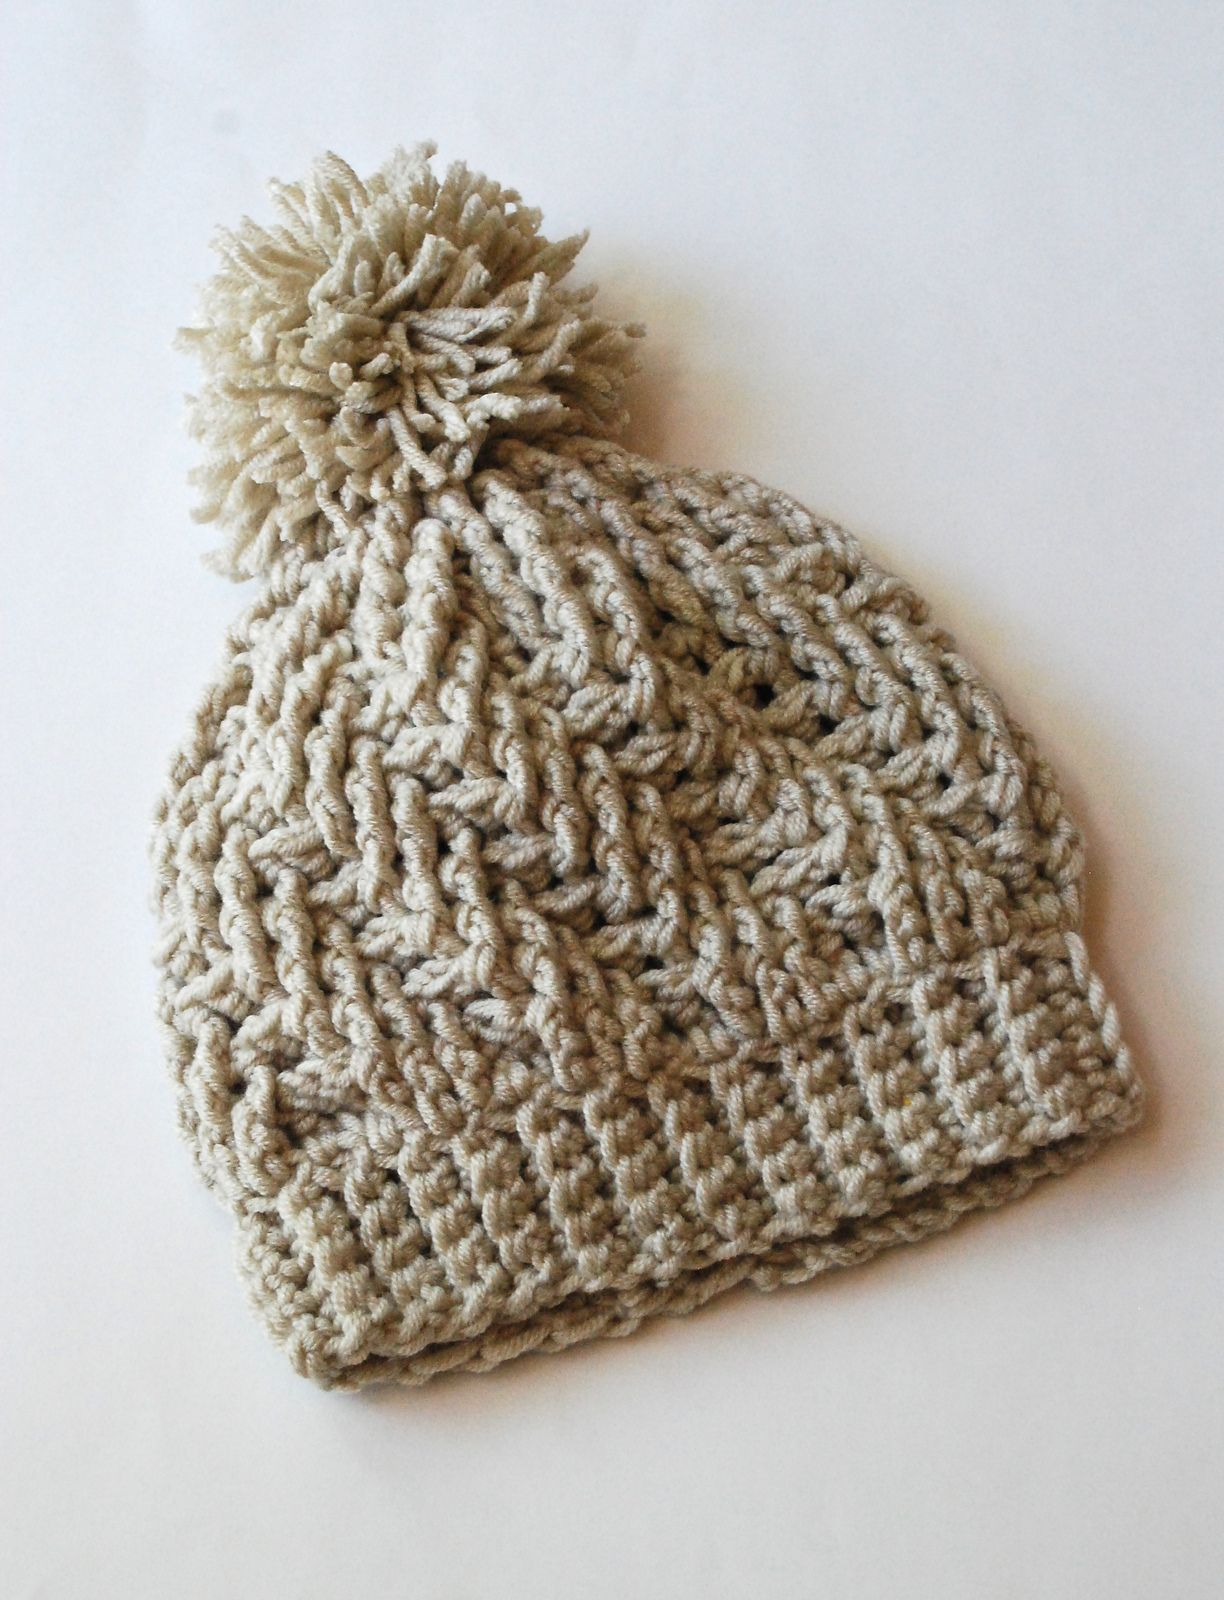 Stepping Texture Hat By Bernat Design Studio - Free Crochet Pattern -  (ravelry) 7d5b9246380